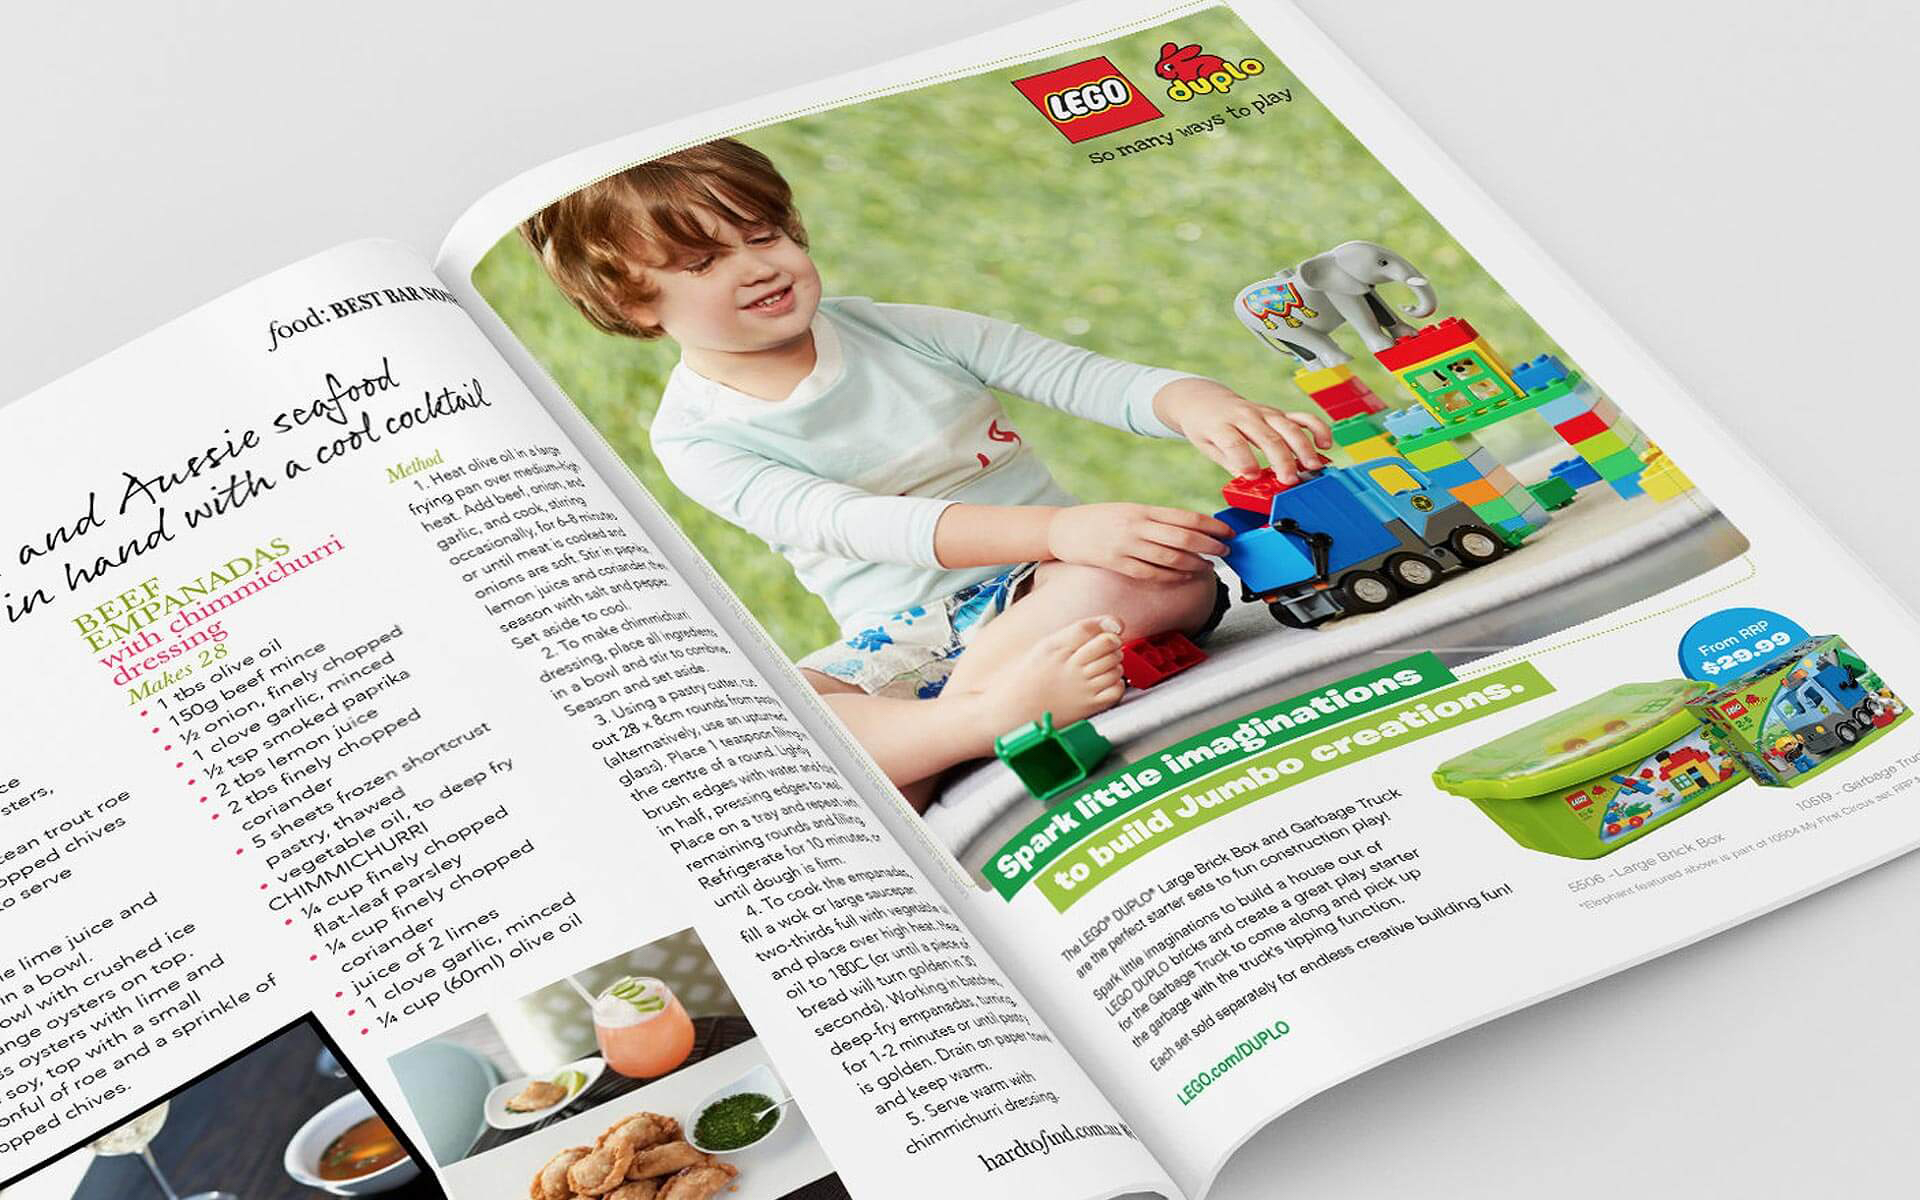 LEGO Duplo print ad, Spark little imaginations to build JUMBO creations